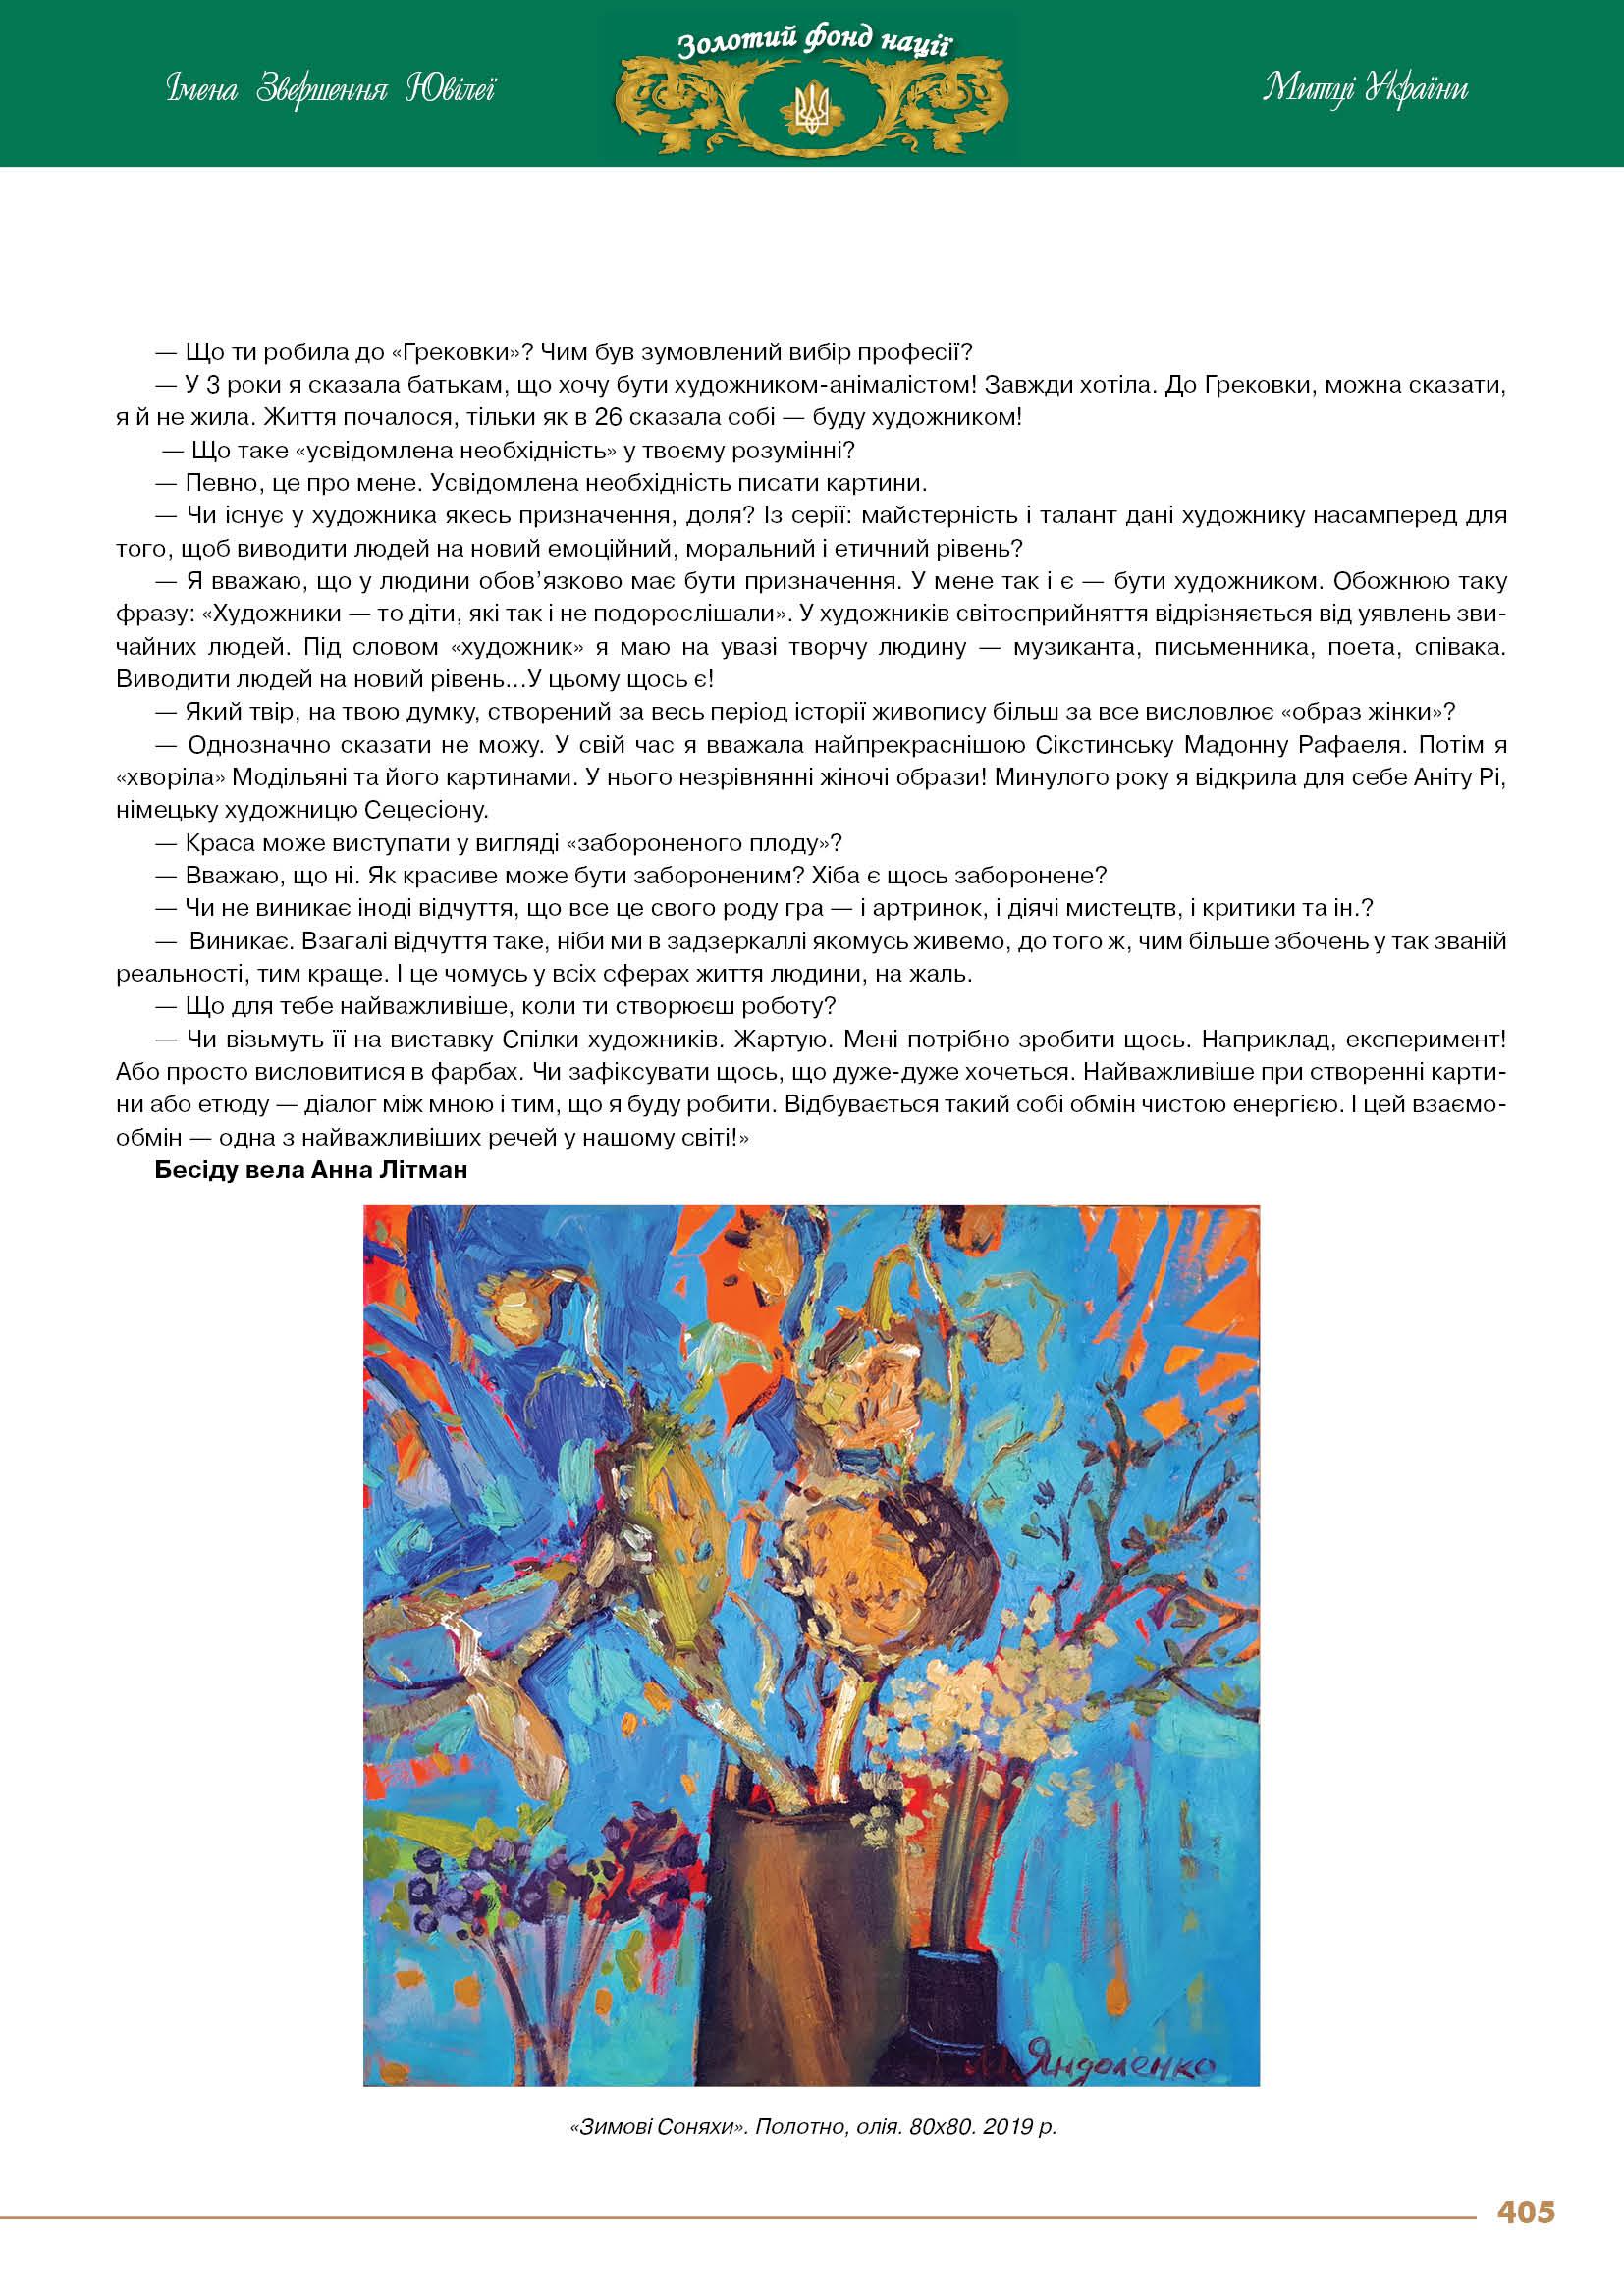 Яндоленко Марина Валеріївна